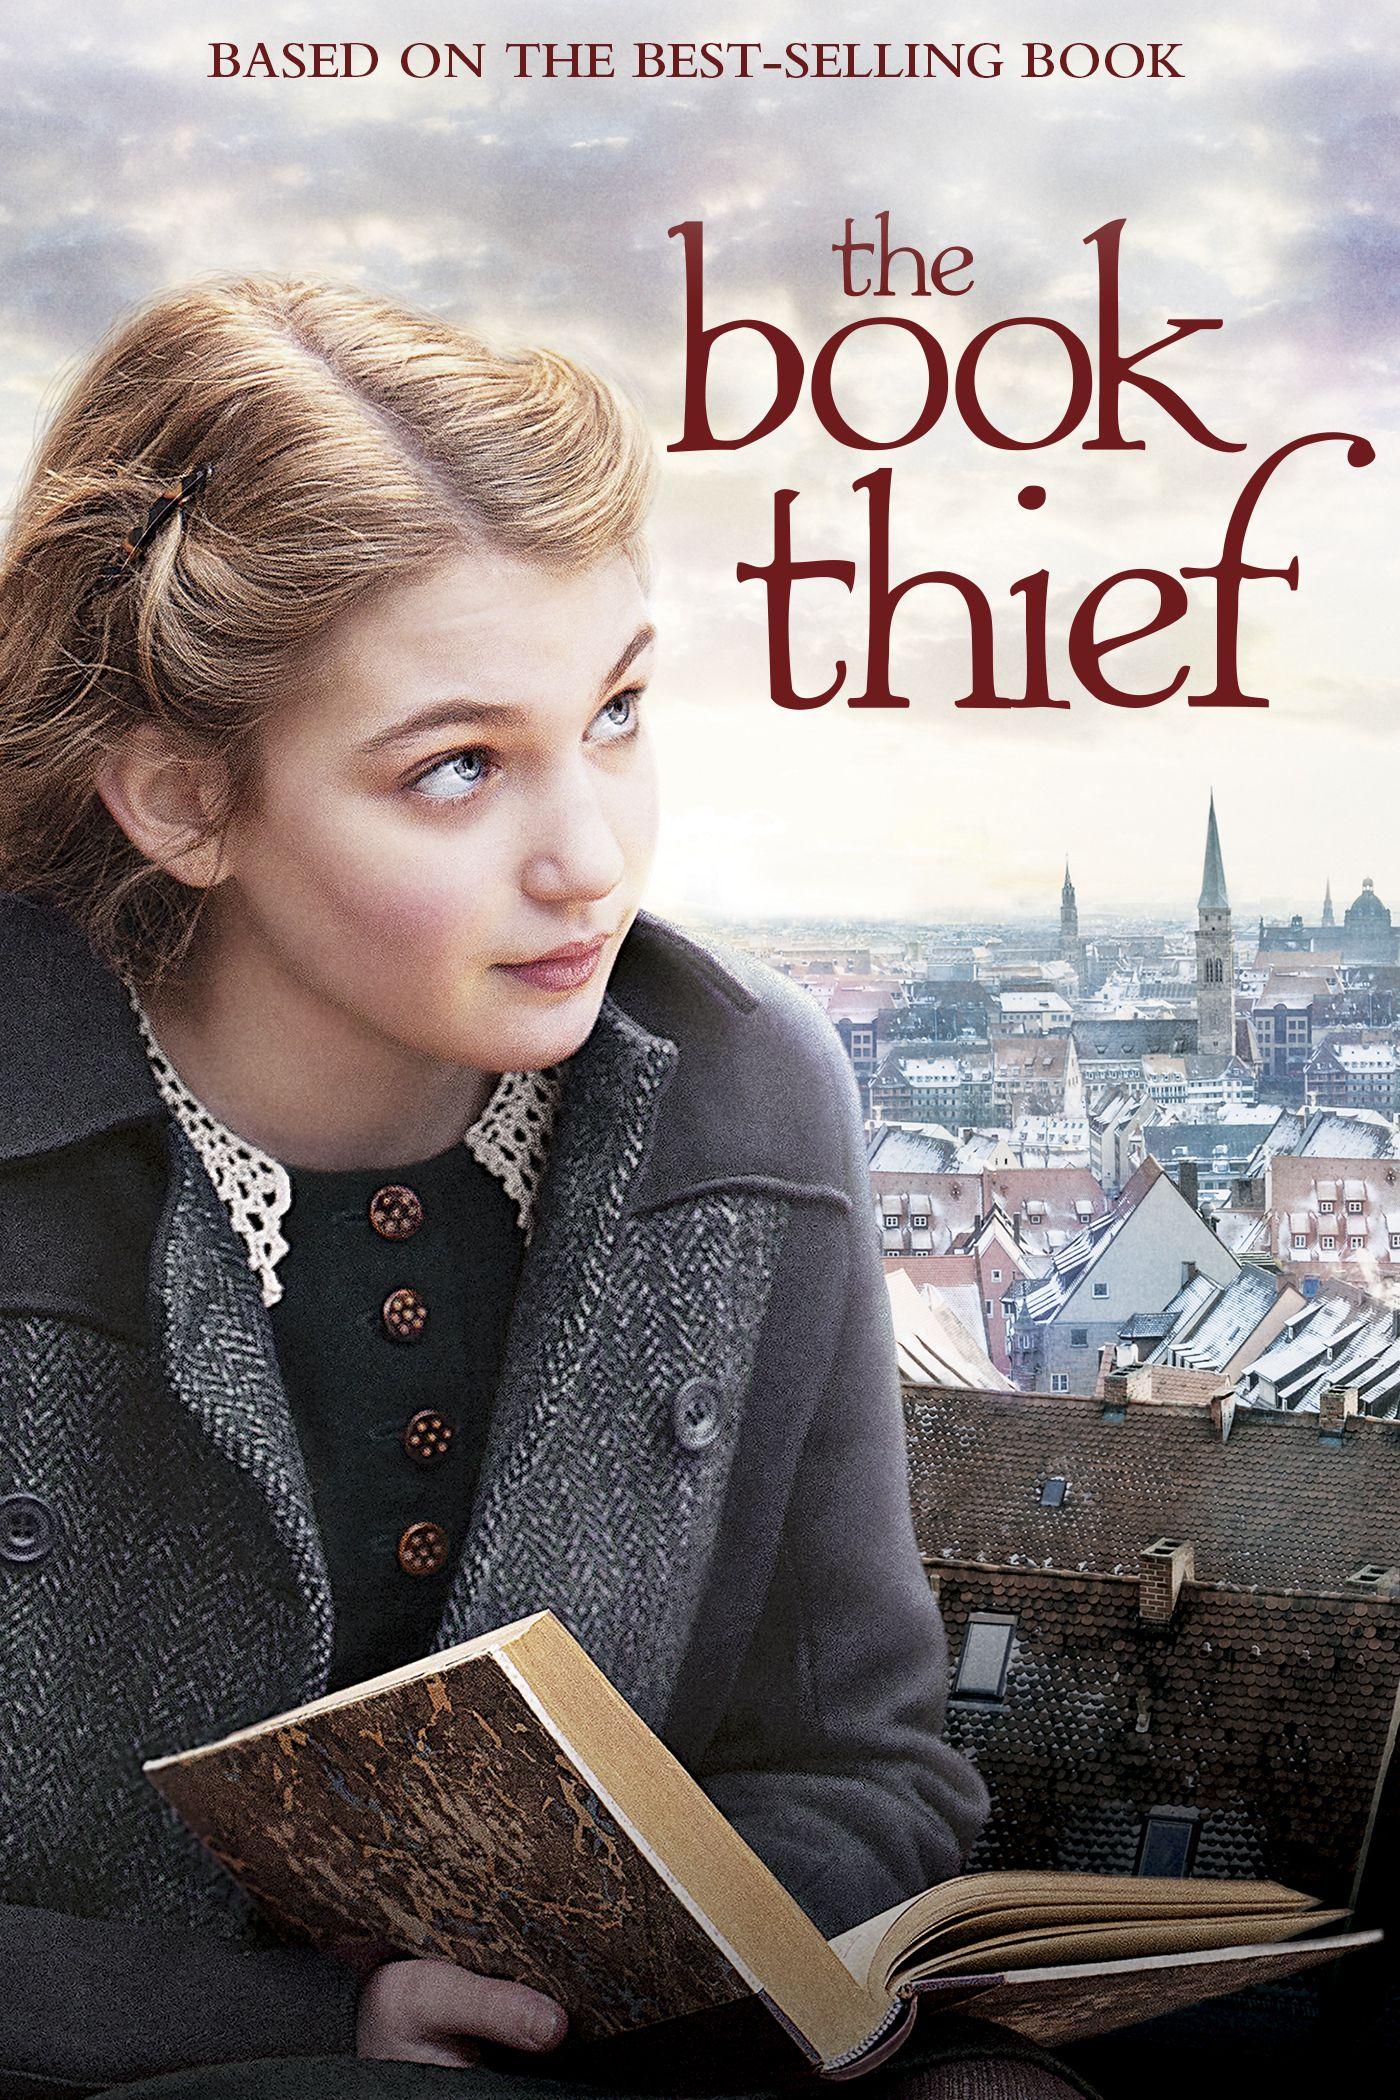 Sgxr9ezuvytk0hc4athmixxdj8e Jpg 1400 2100 The Book Thief Good Movies To Watch Good Movies